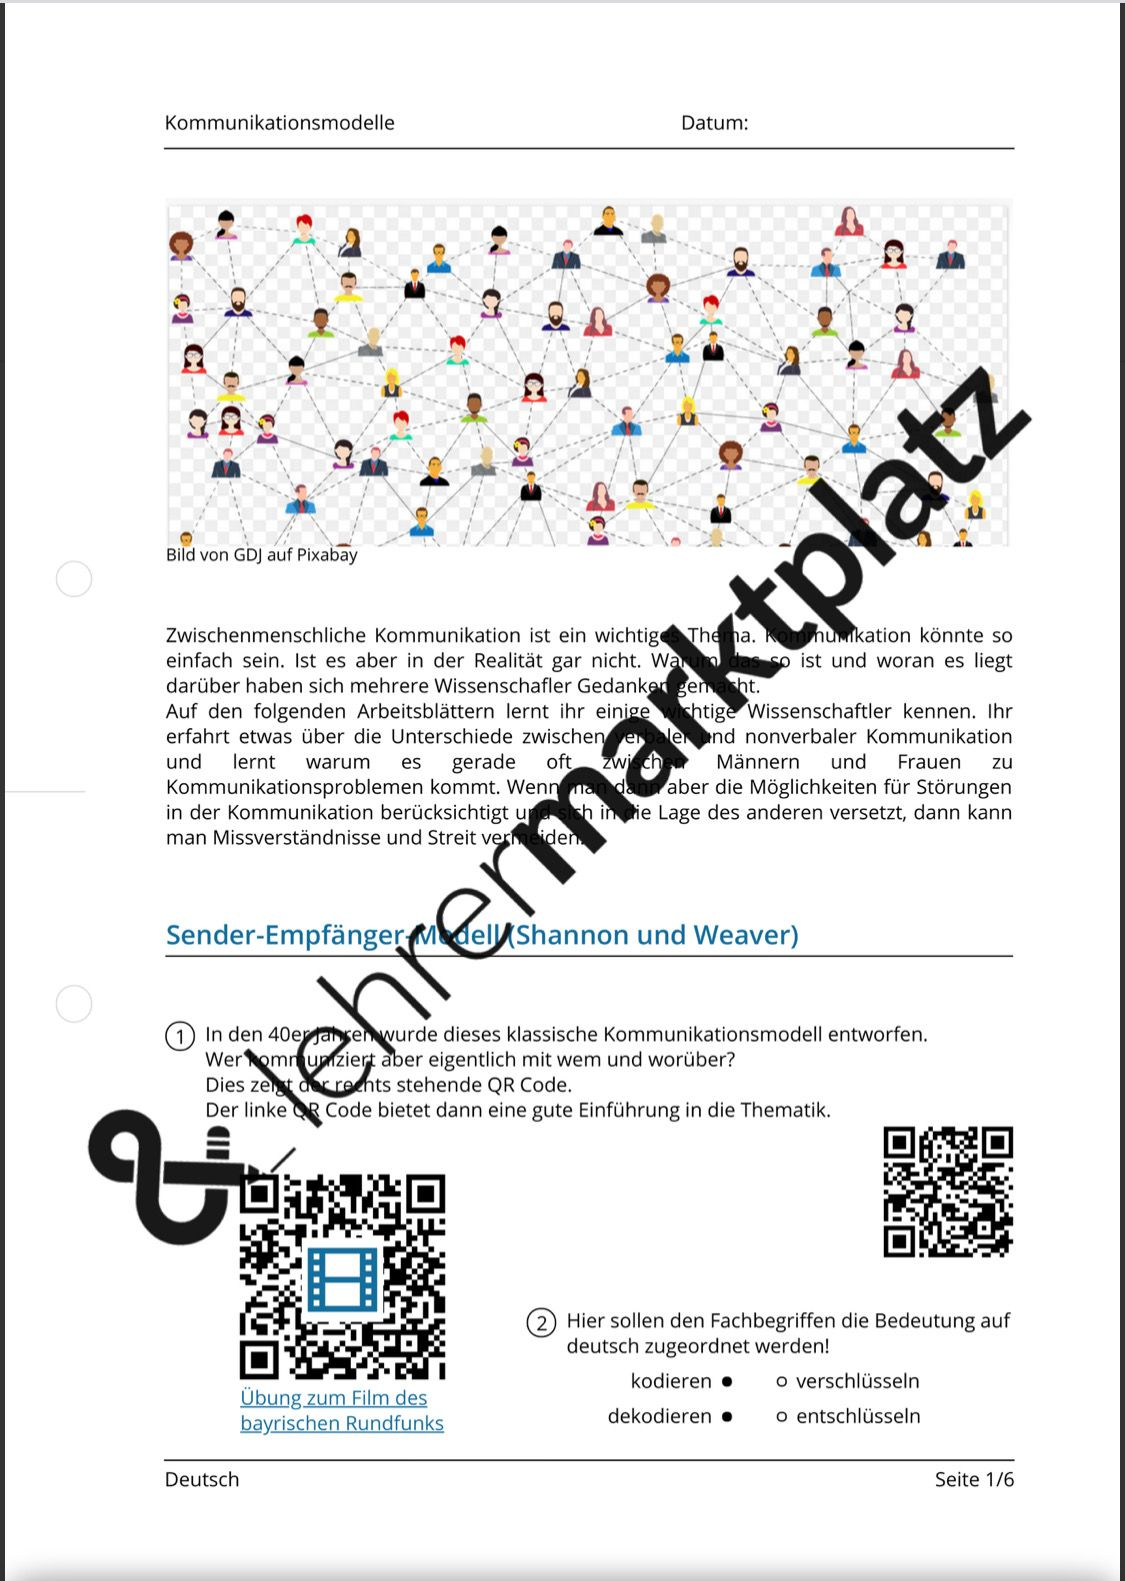 Kommunikationsmodelle Qr Codes In 2020 Kommunikationsmodelle Kommunikation Zwischenmenschliche Kommunikation